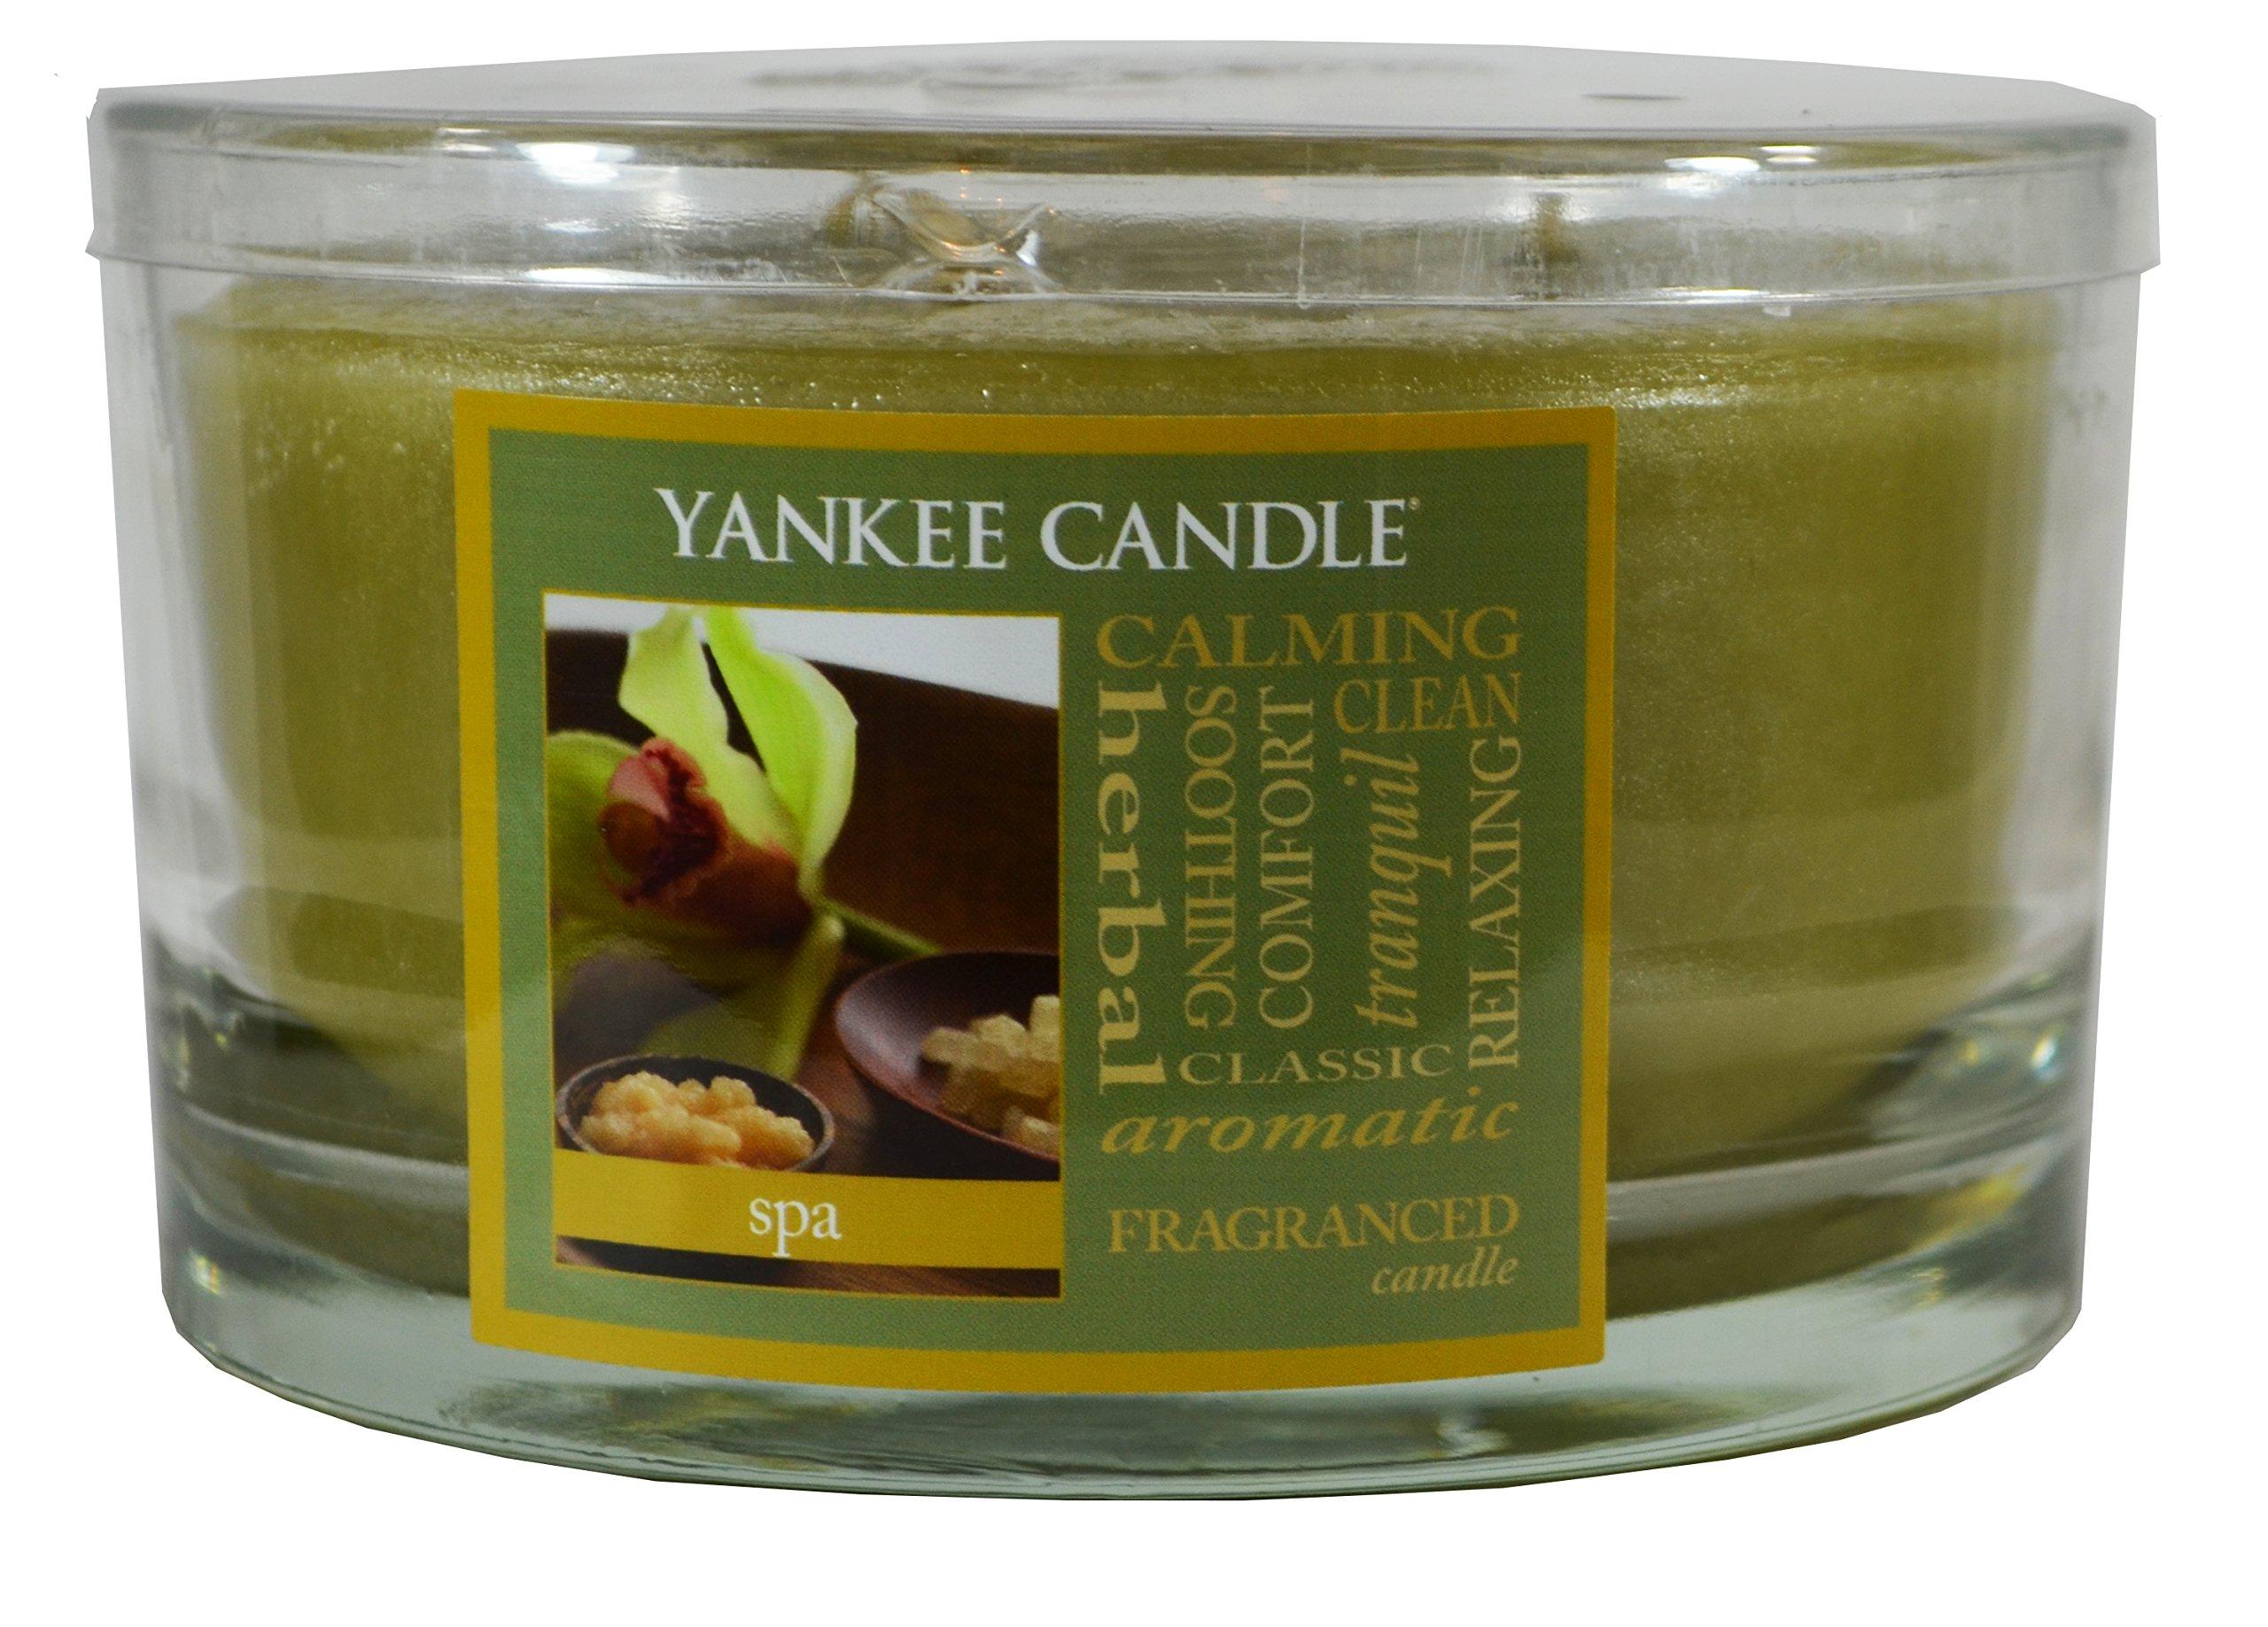 Yankee Candle 17 oz 3-Wick Dish Candle - SPA